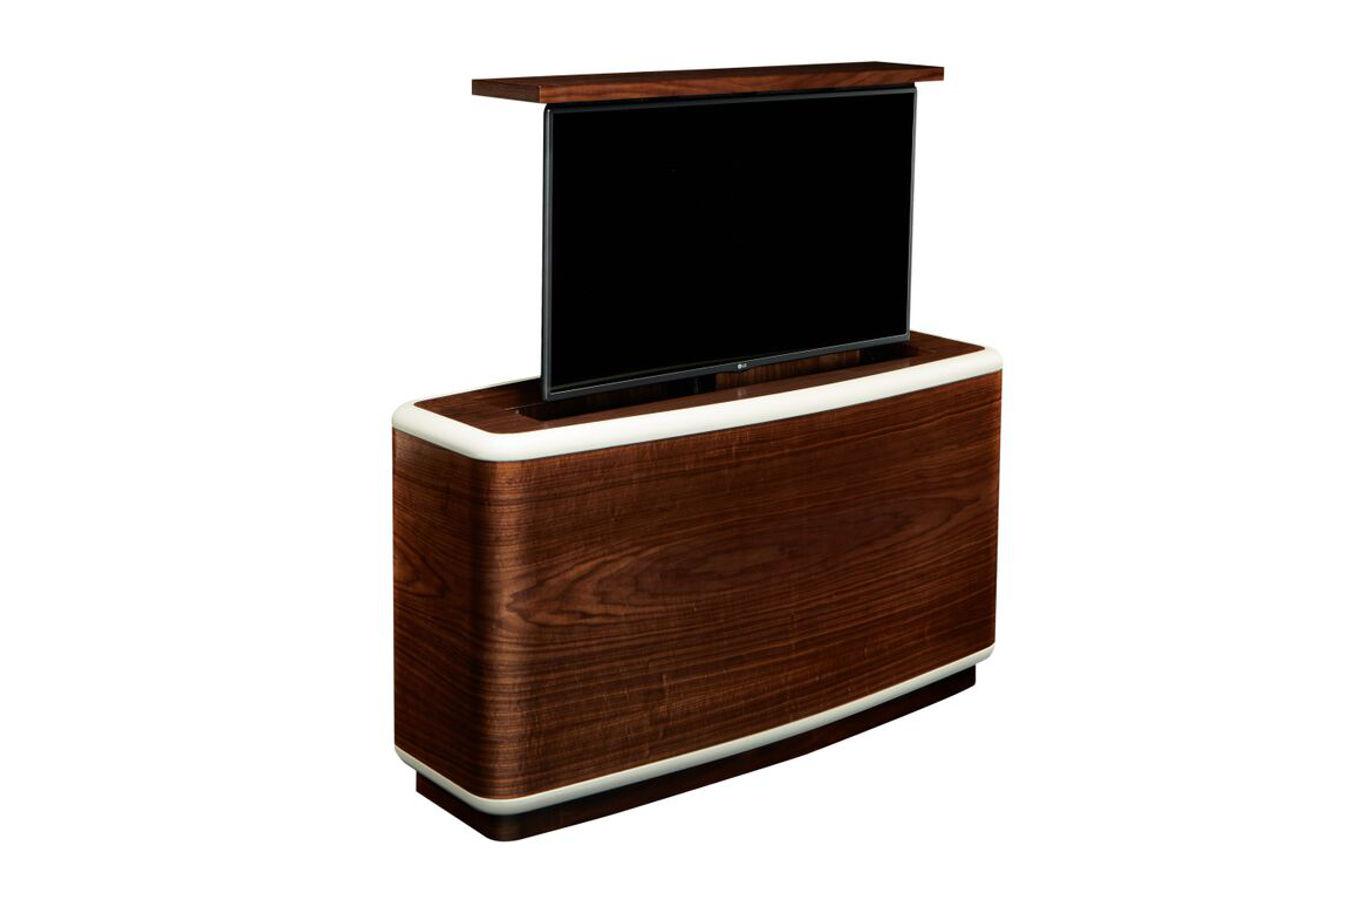 TV lift cabinets  motorized tv stand  Fercarra Modern tv